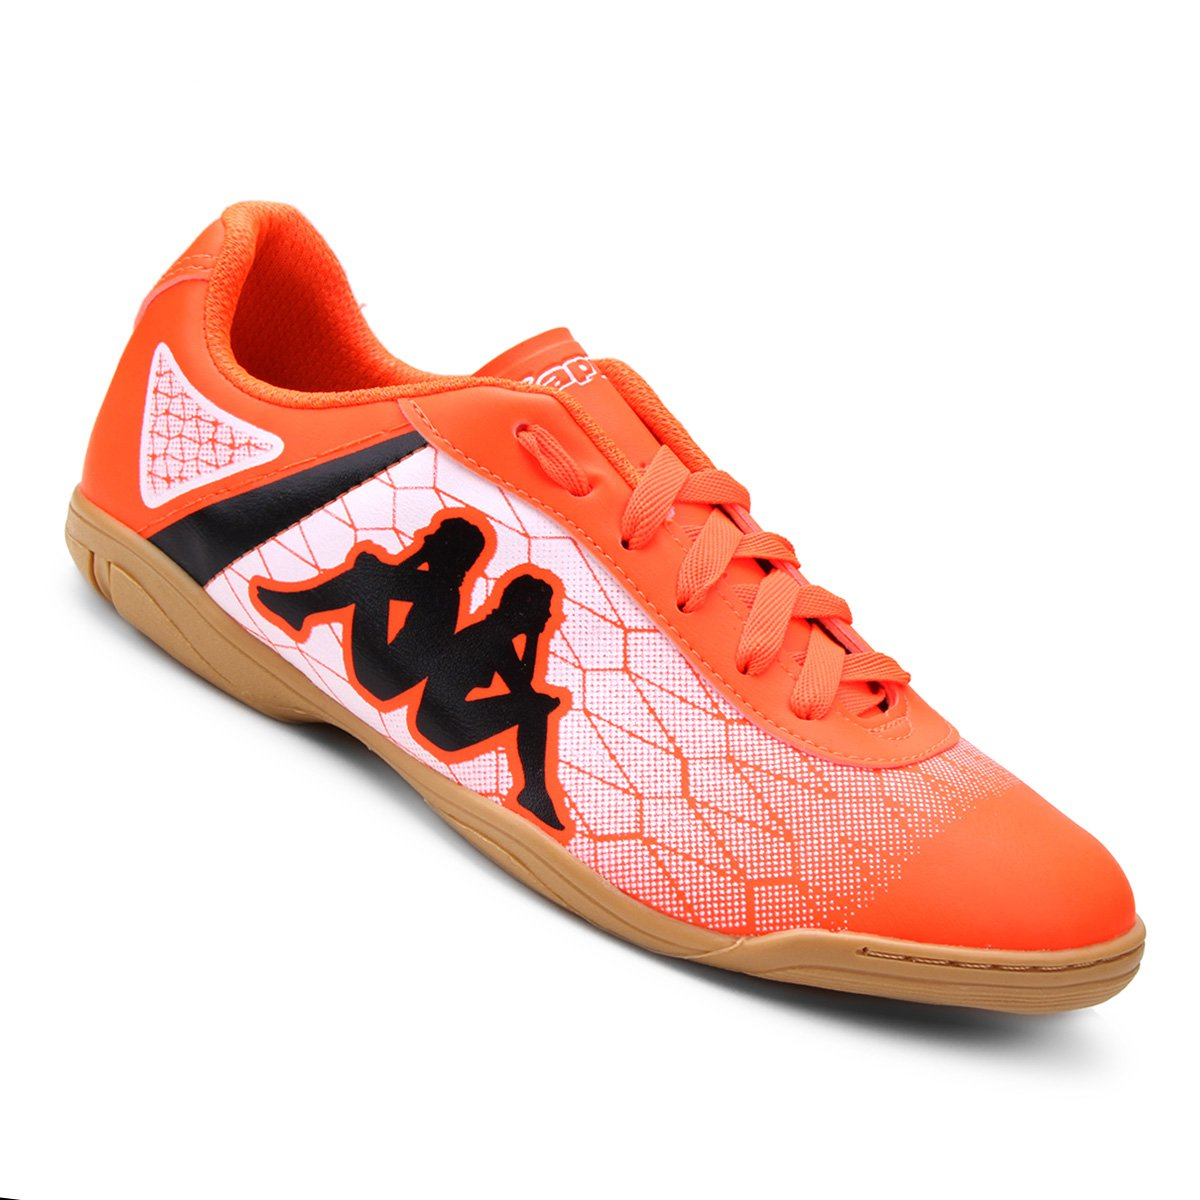 Chuteira Futsal Kappa Torpedo - Laranja e Branco - Compre Agora  ac0ec62172423